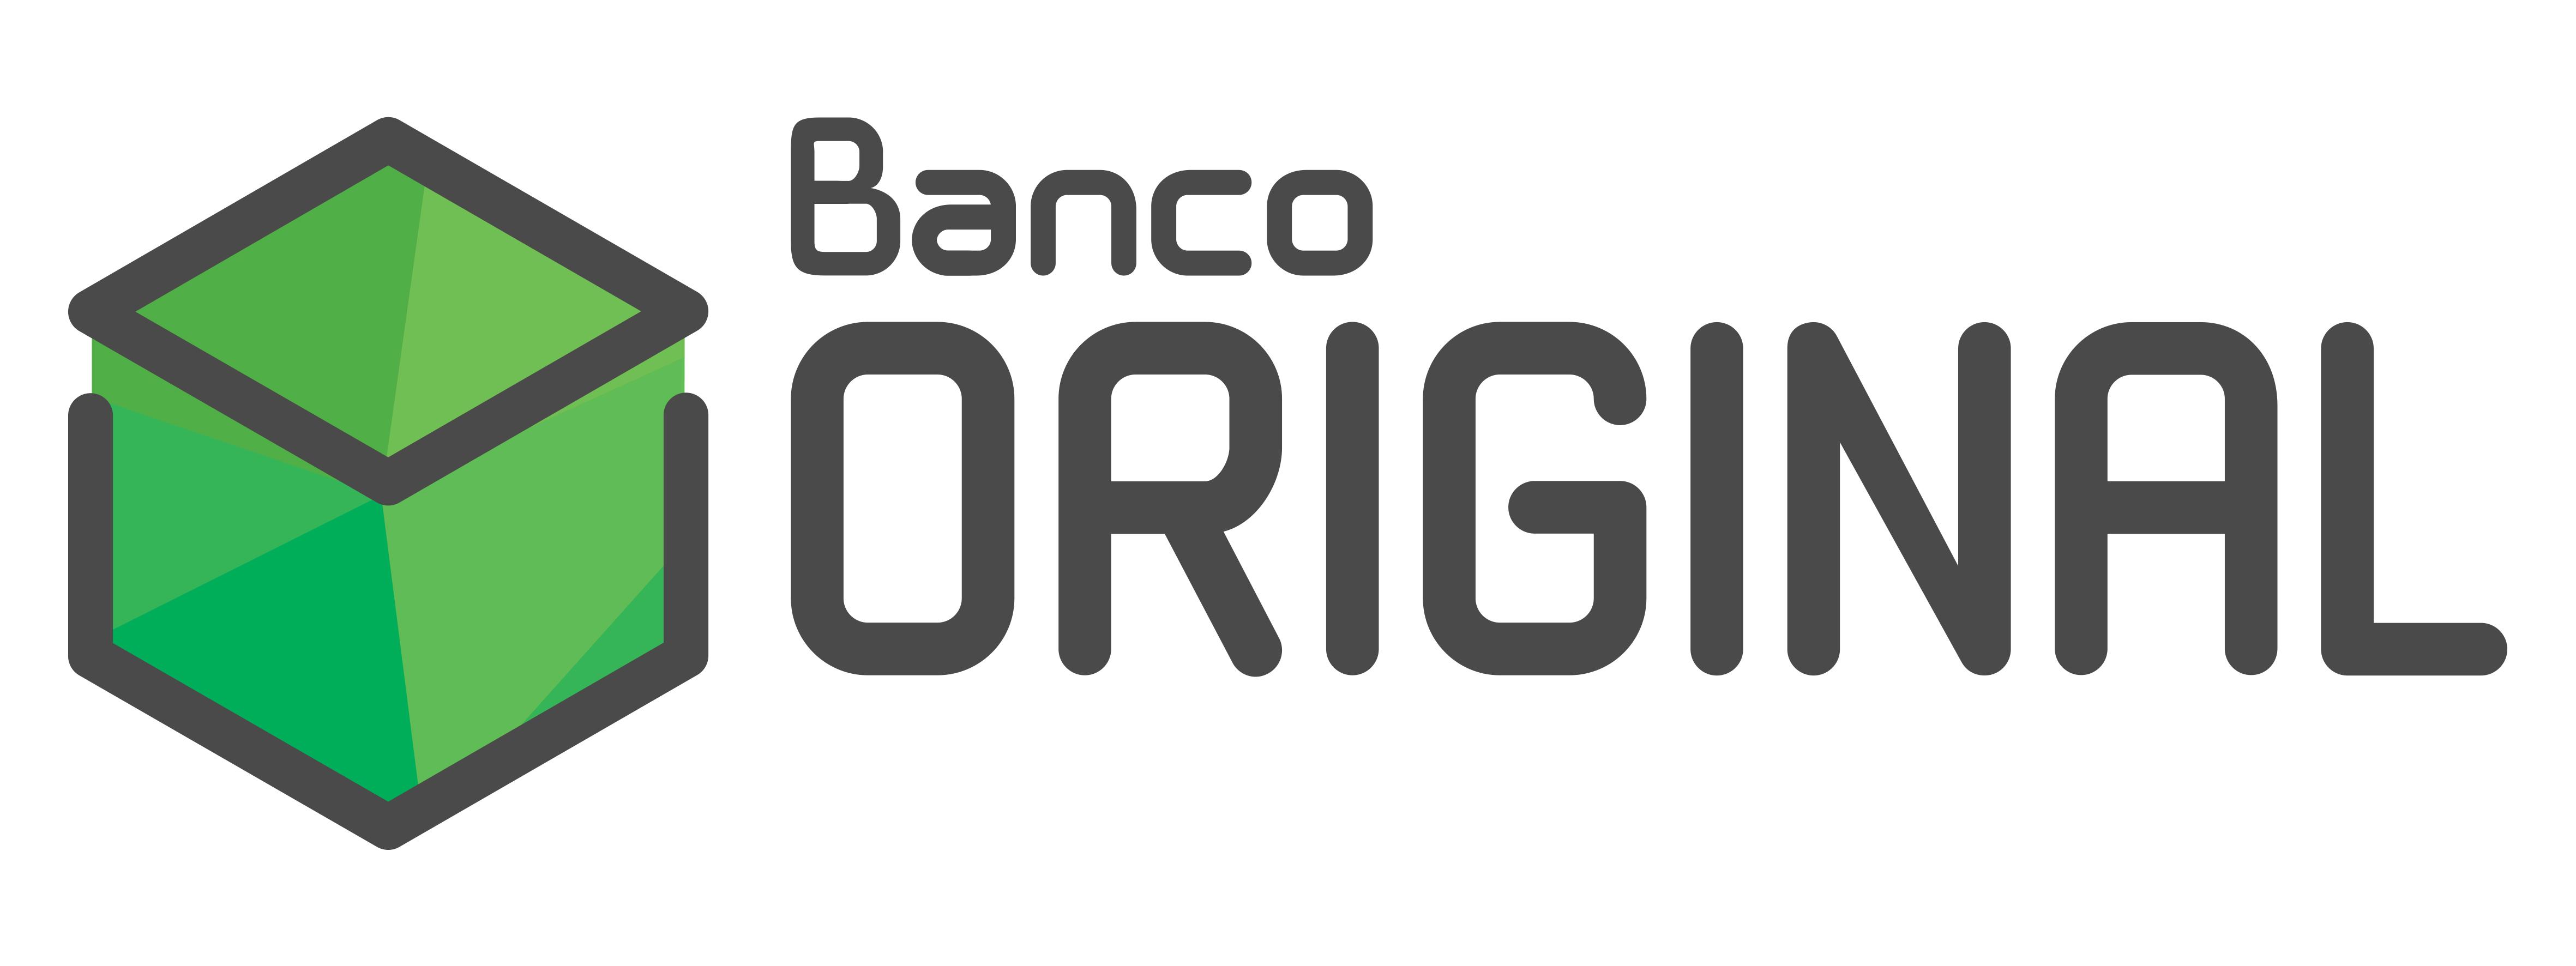 banco original wikiwand